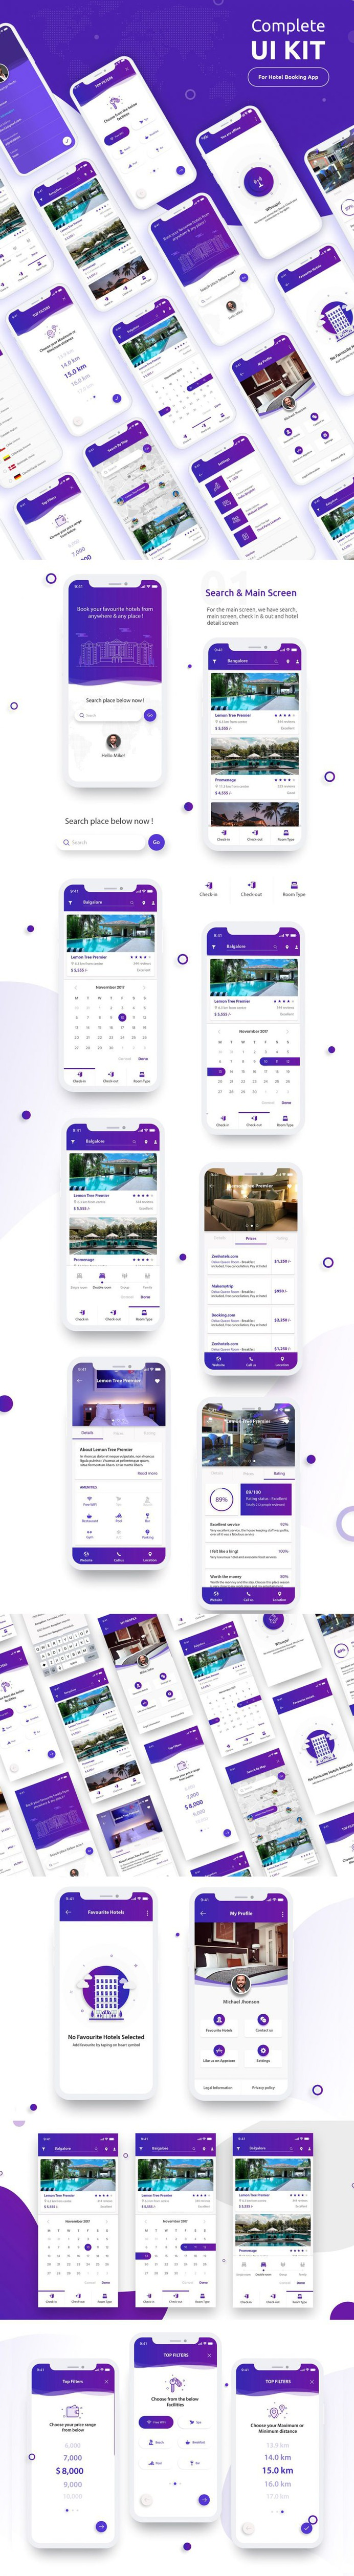 Complete UI Kit – Hotel Booking App